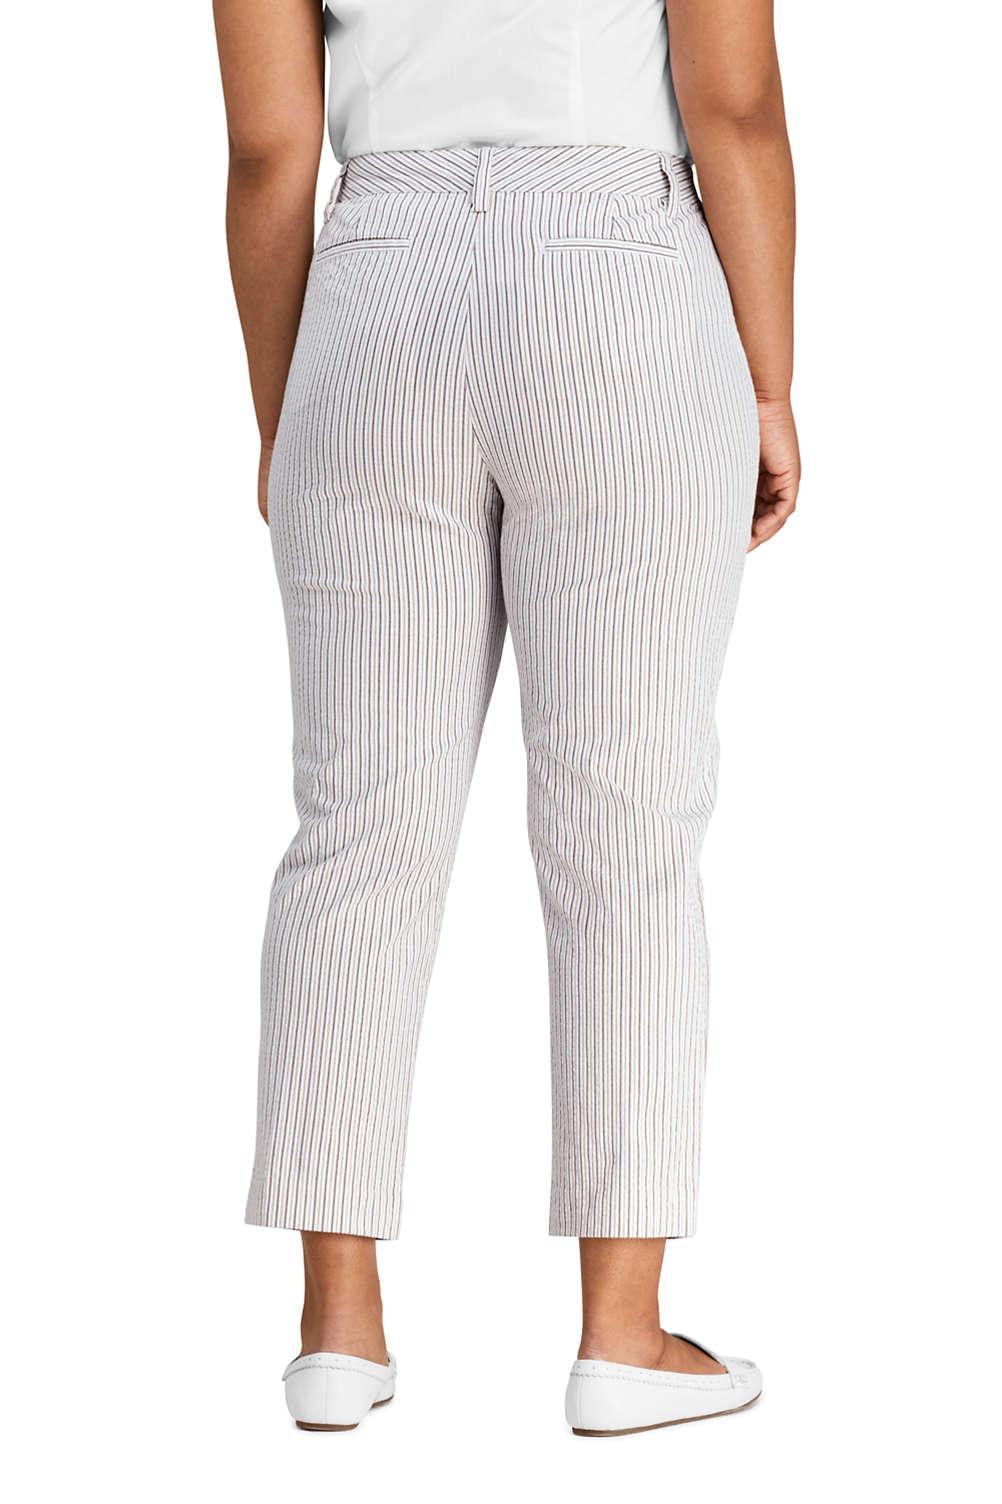 32d05c30941 Women s Plus Size Mid Rise Seersucker Capri Pants. Item  508240AH0. View  Fullscreen